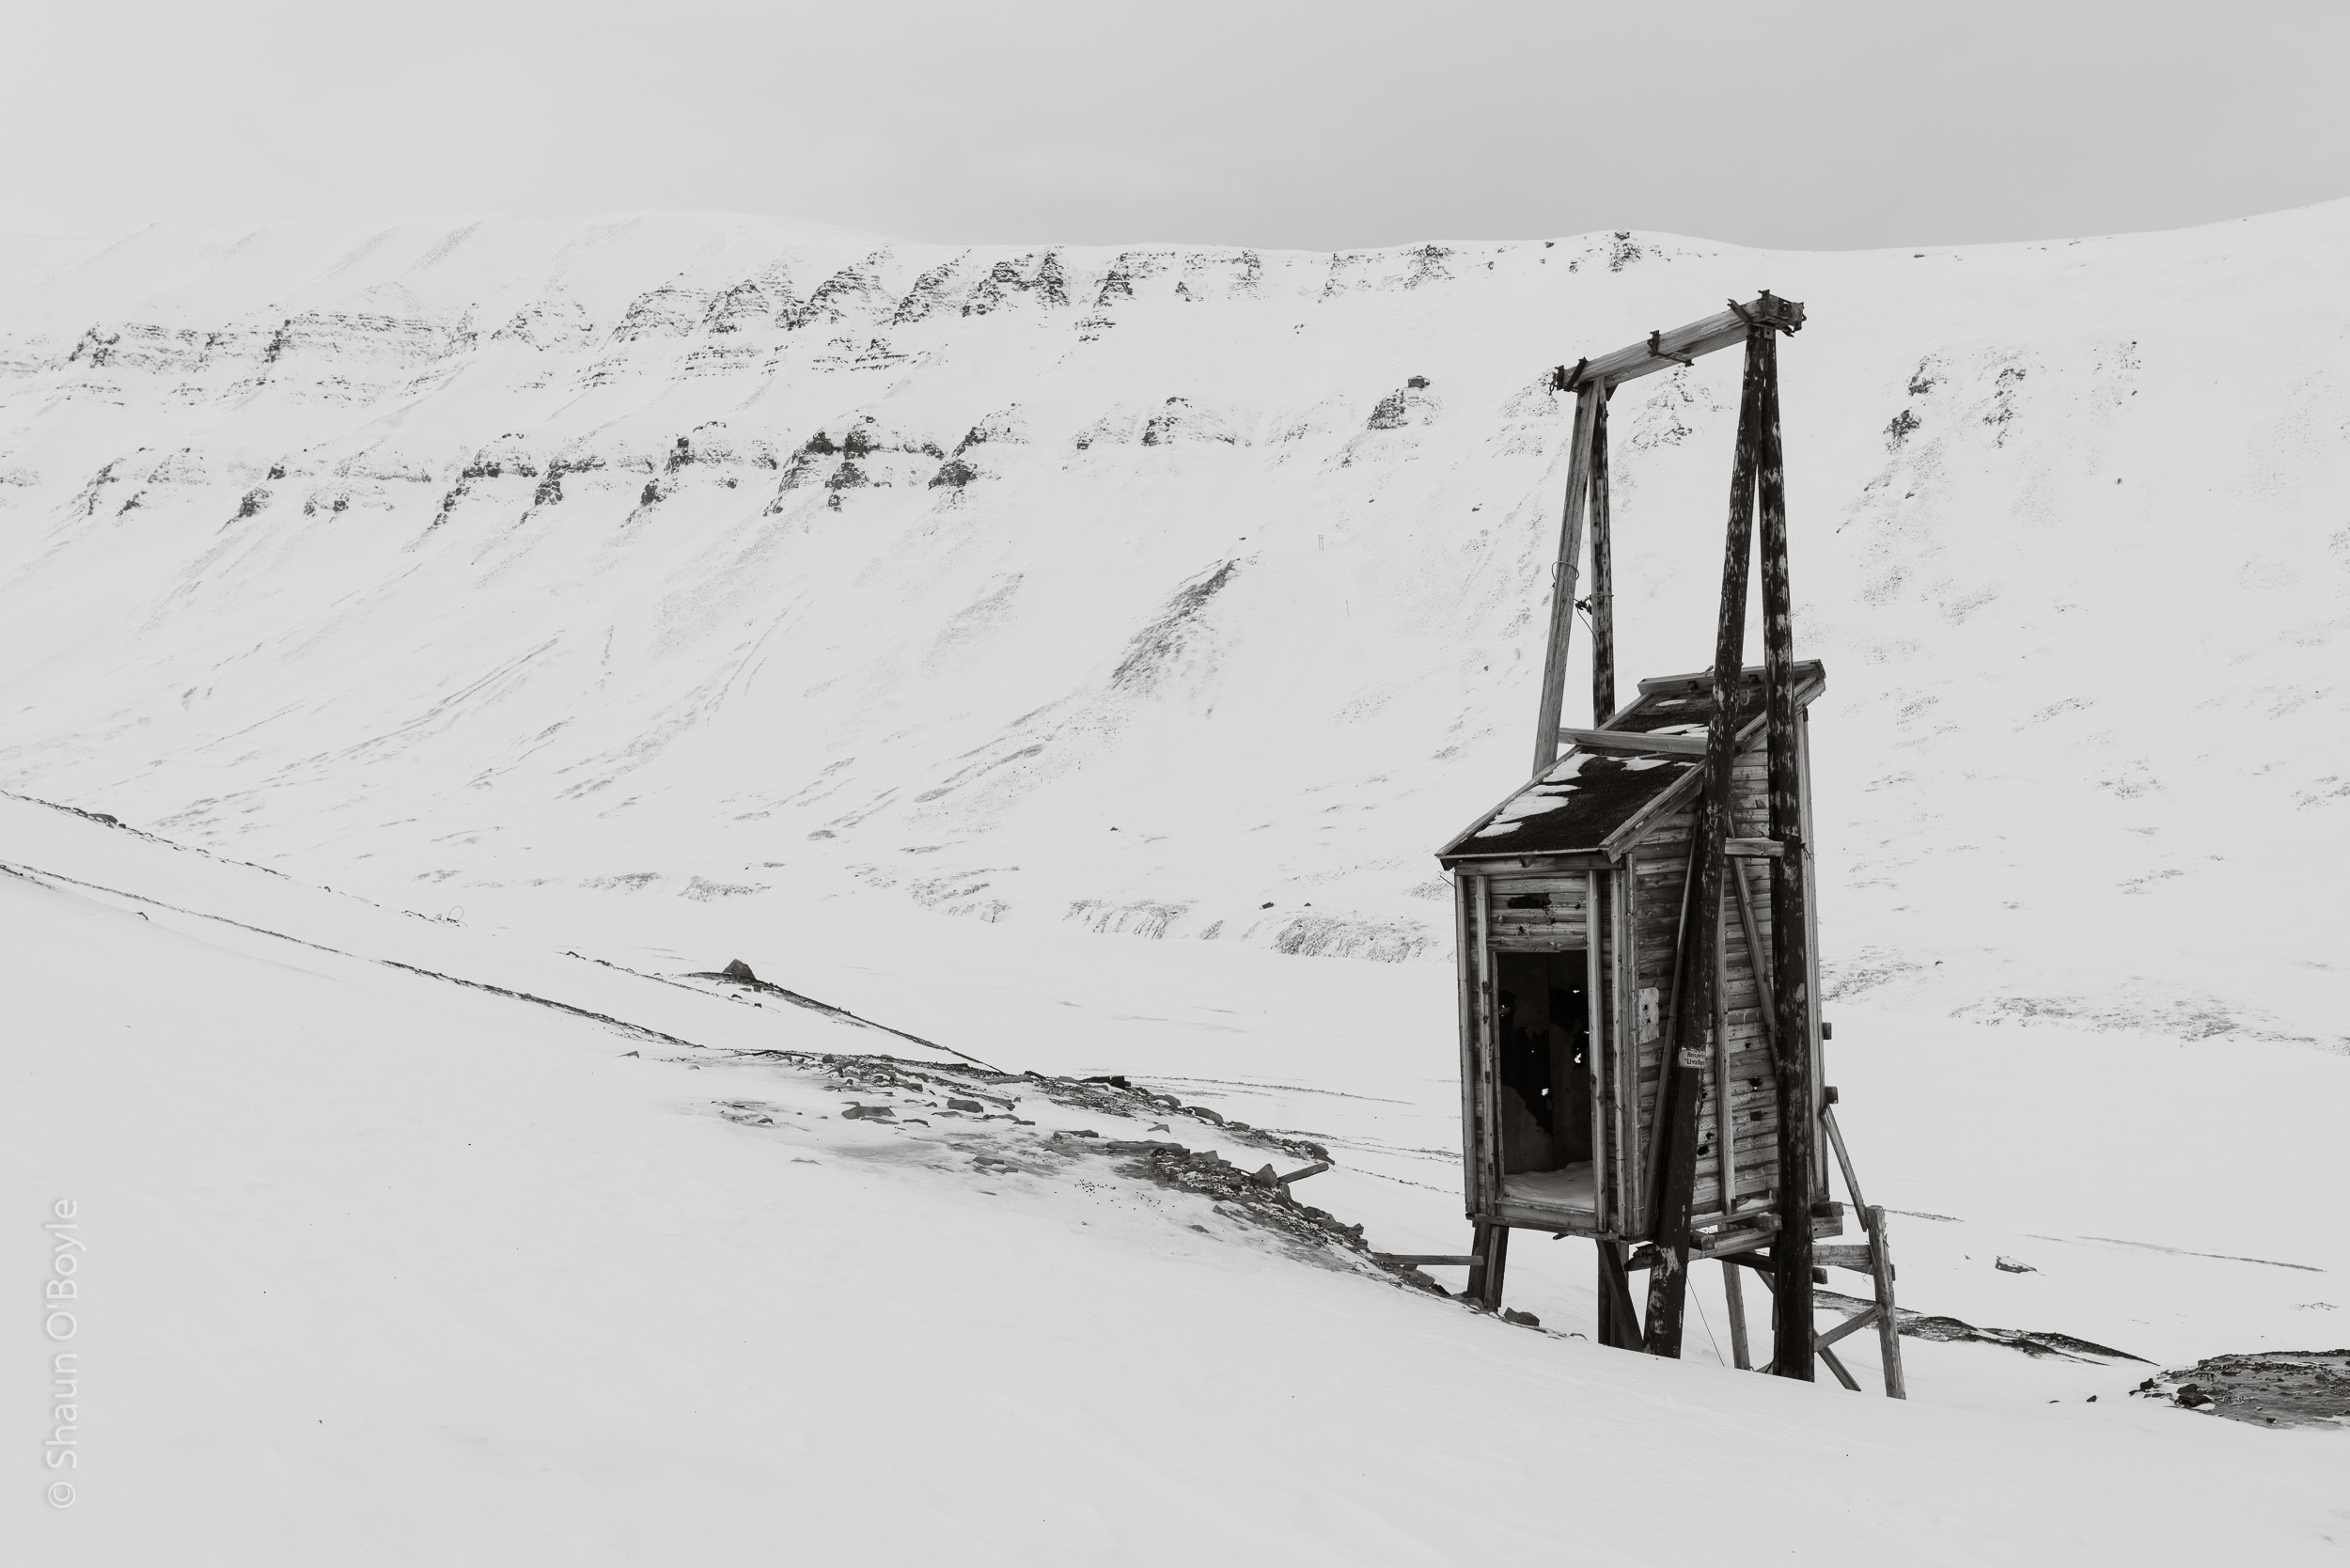 Coal Mine #5, Endalen, Spitsbergen